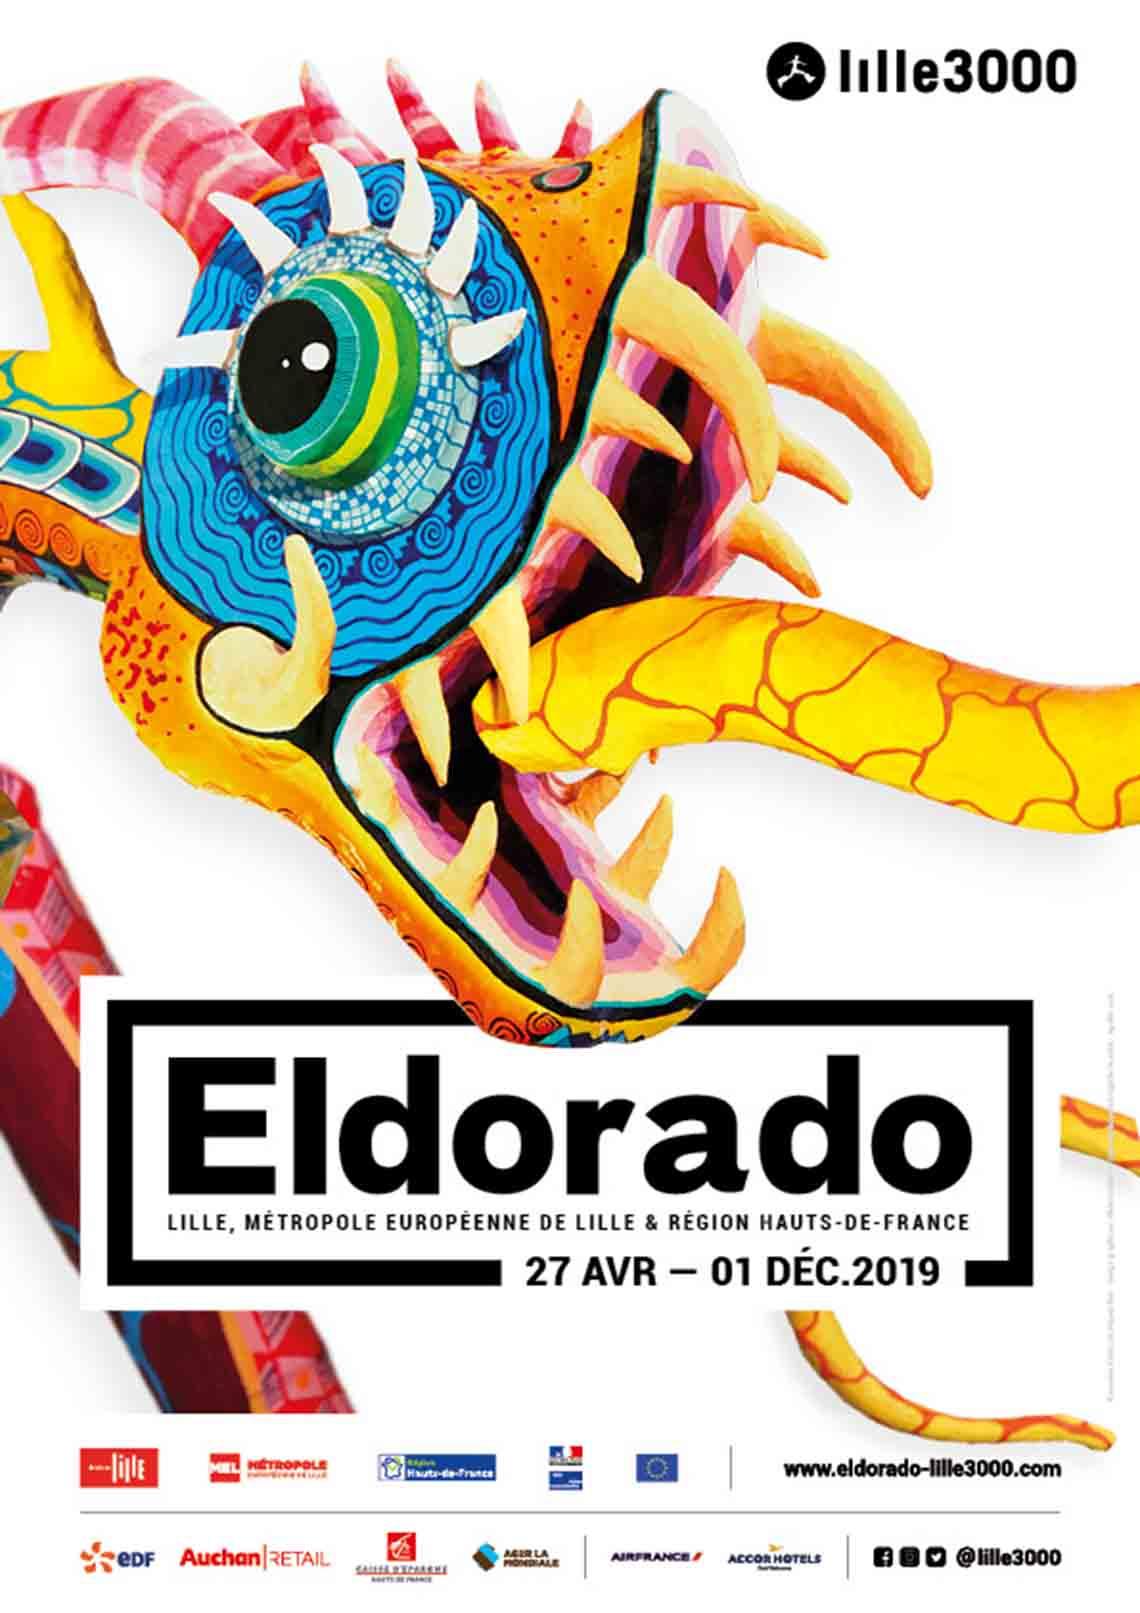 Eldorado Lille3000 - Travelvibe